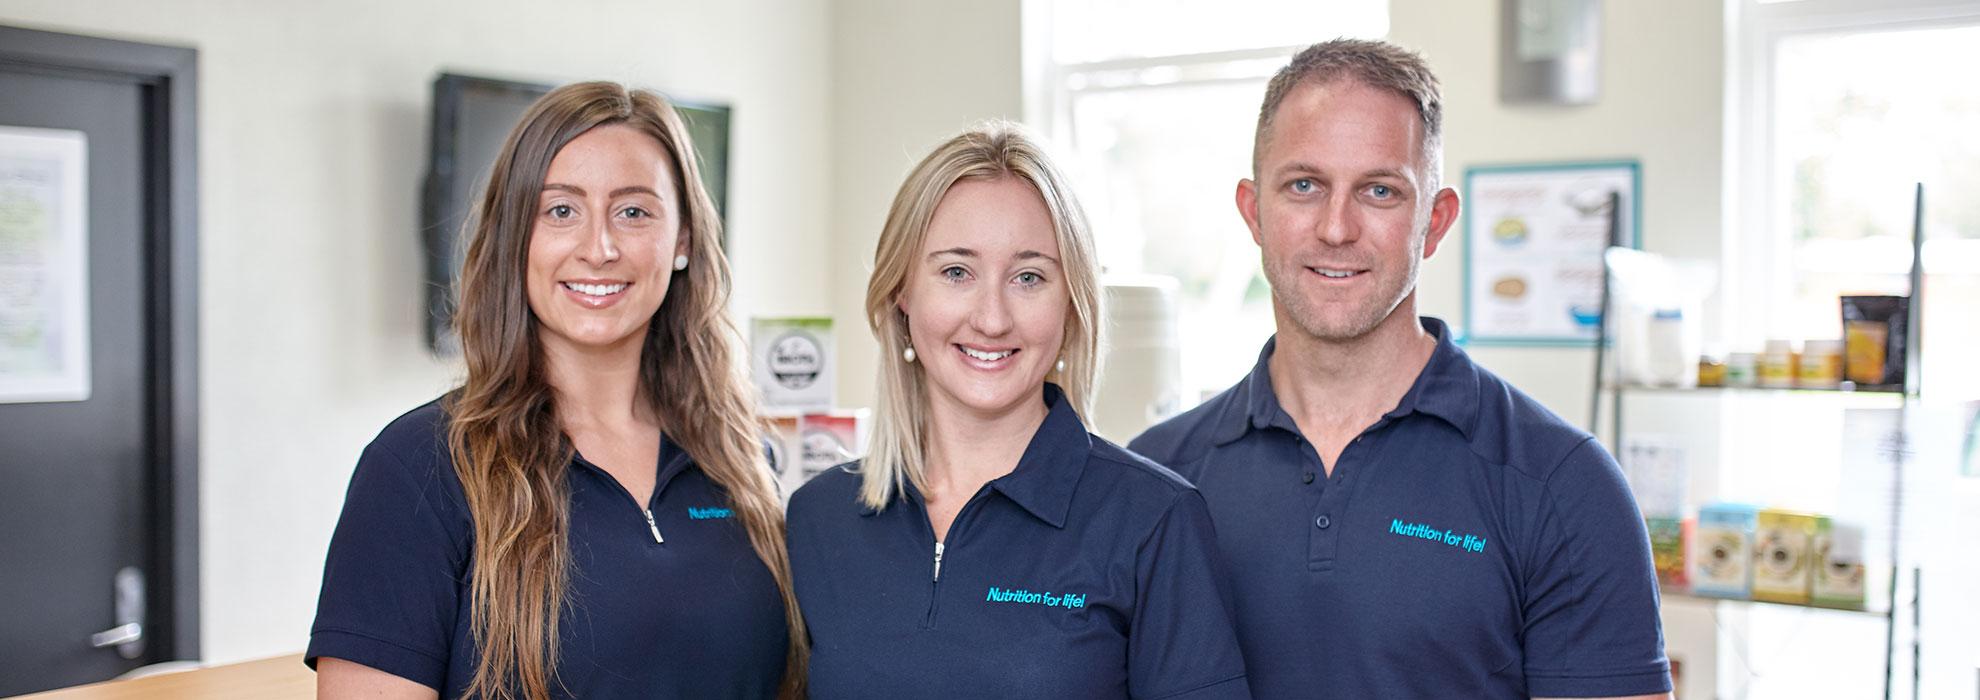 nutrition for life - dietitian health coaches tasmania